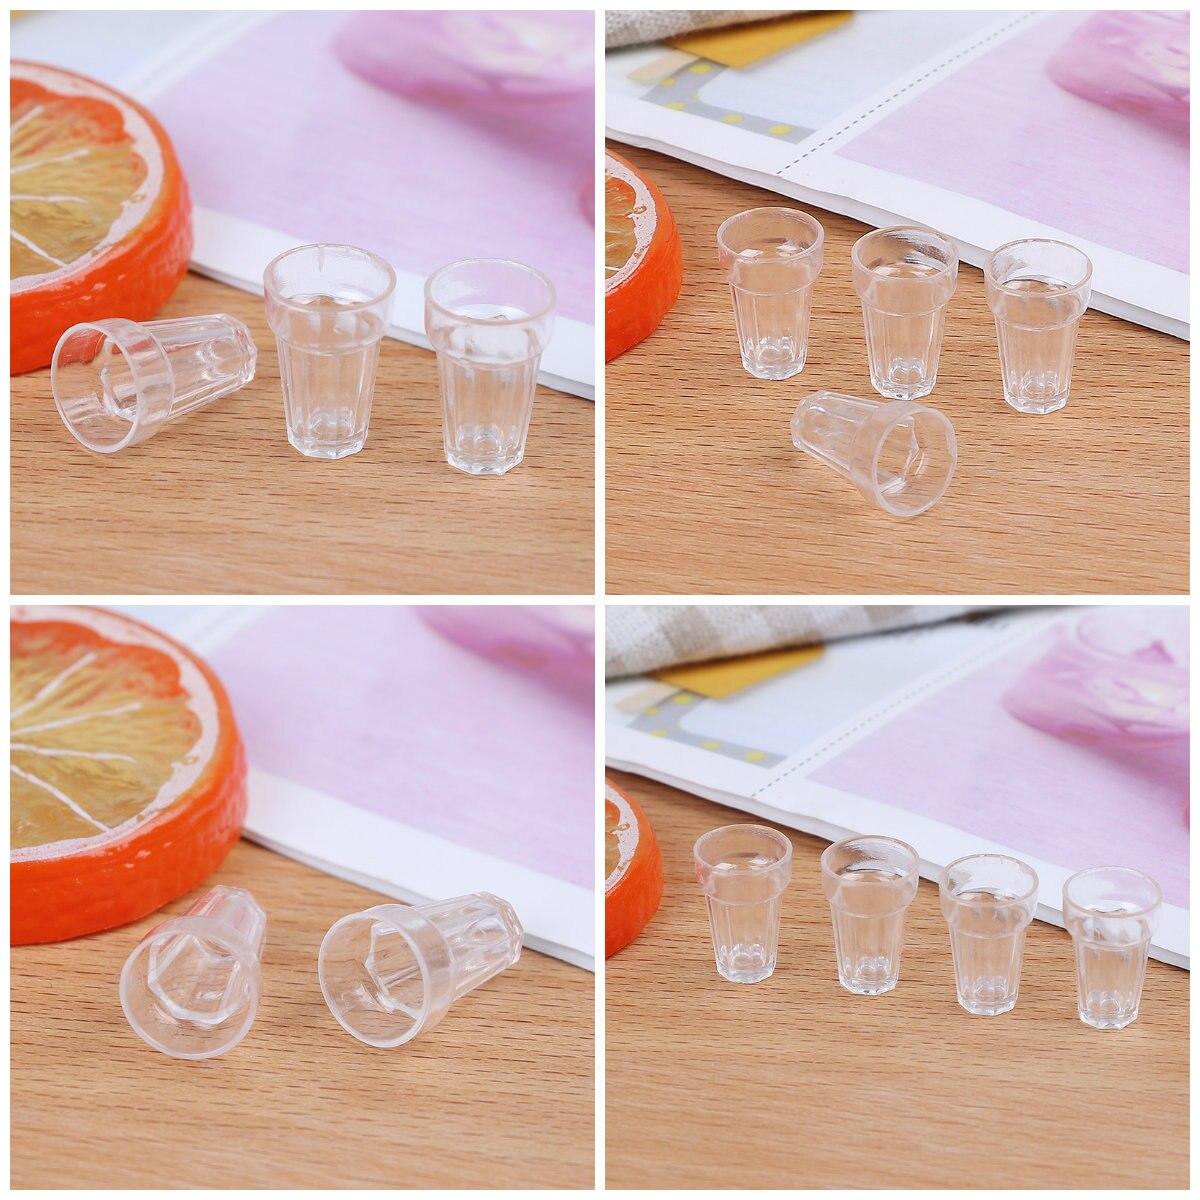 Home Intelligent 4pcs/lot Craft Transparent Miniature Home Decoration Glass Model 13mm*19mm Diy Parts Mini Cola Wine Beer Cup Dollhouse